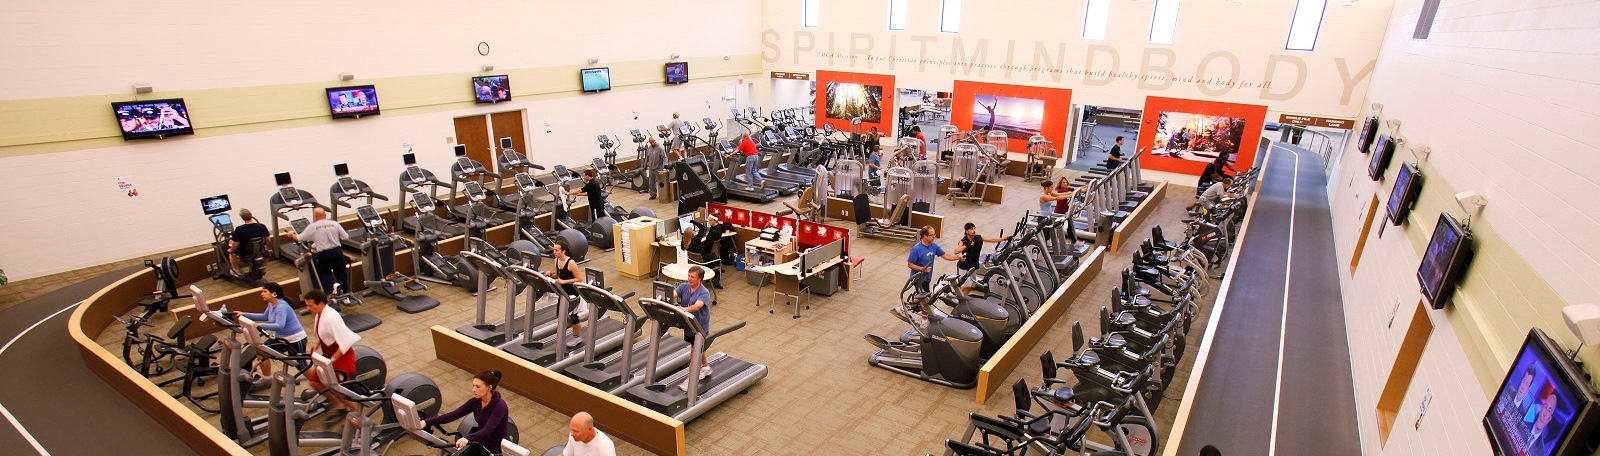 Rite-Hite Family YMCA - YMCA of Metropolitan MilwaukeeYMCA